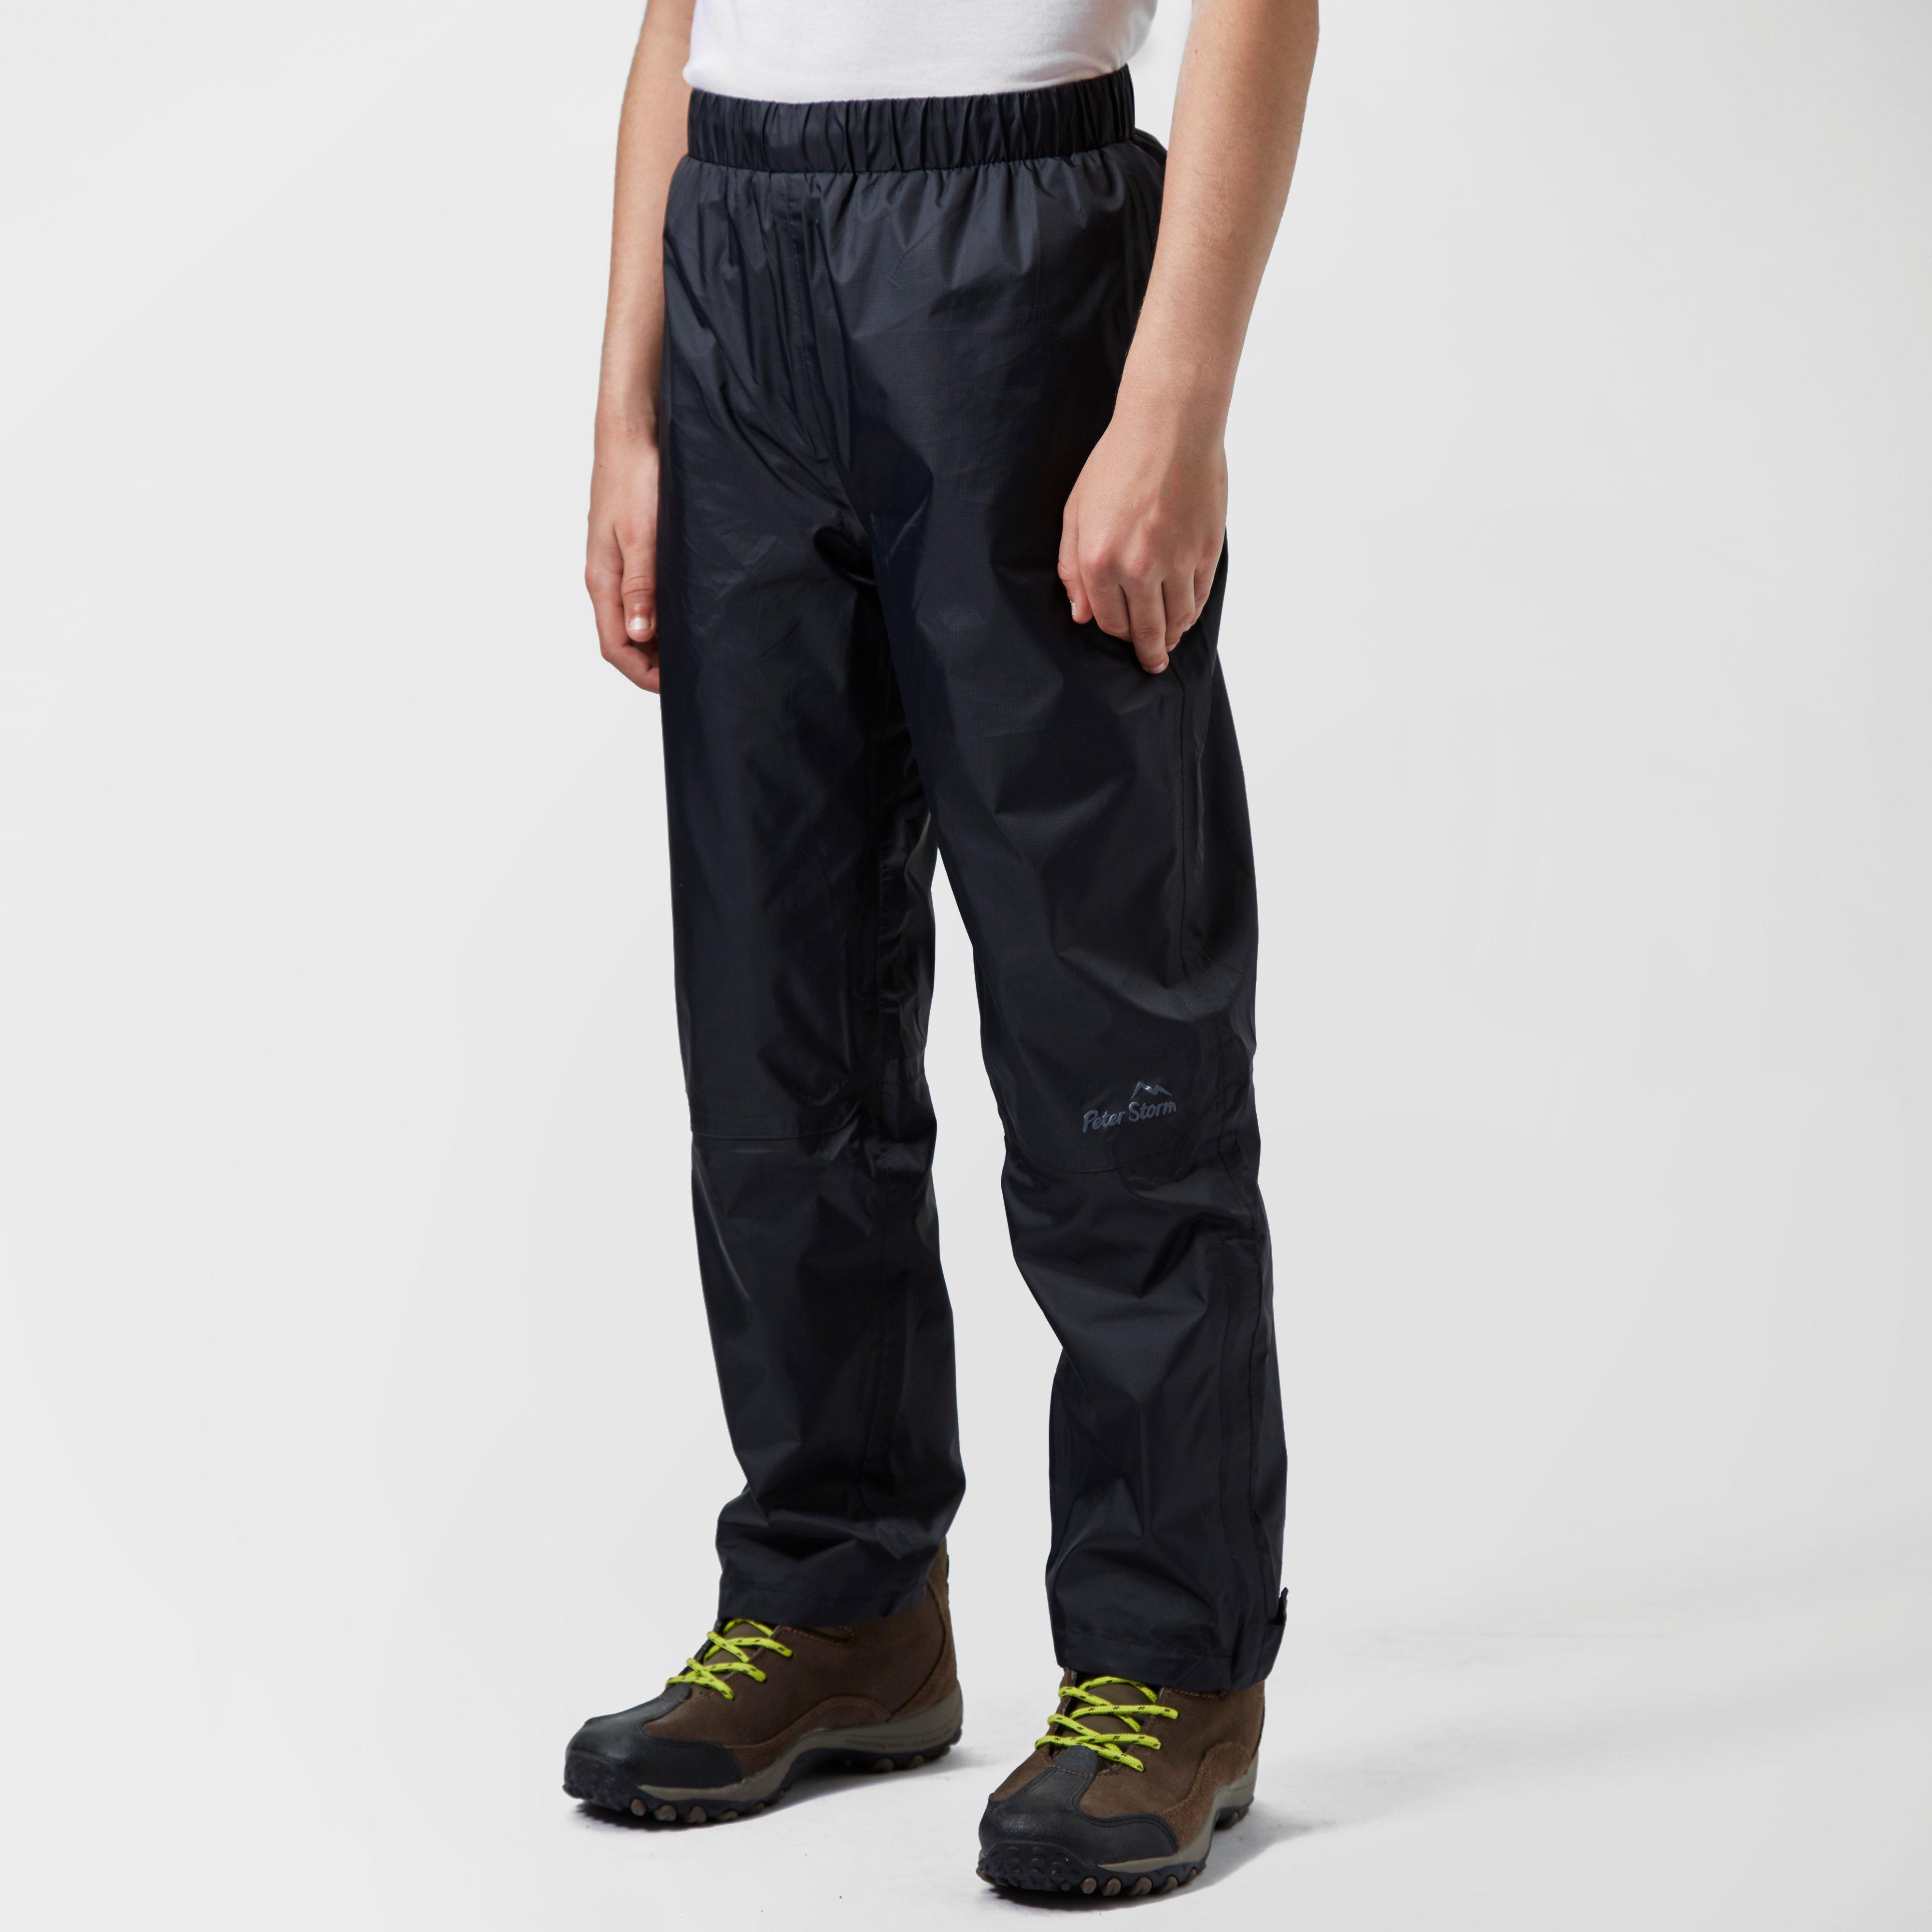 New Peter Storm Kid's Unisex Waterproof Over Trousers